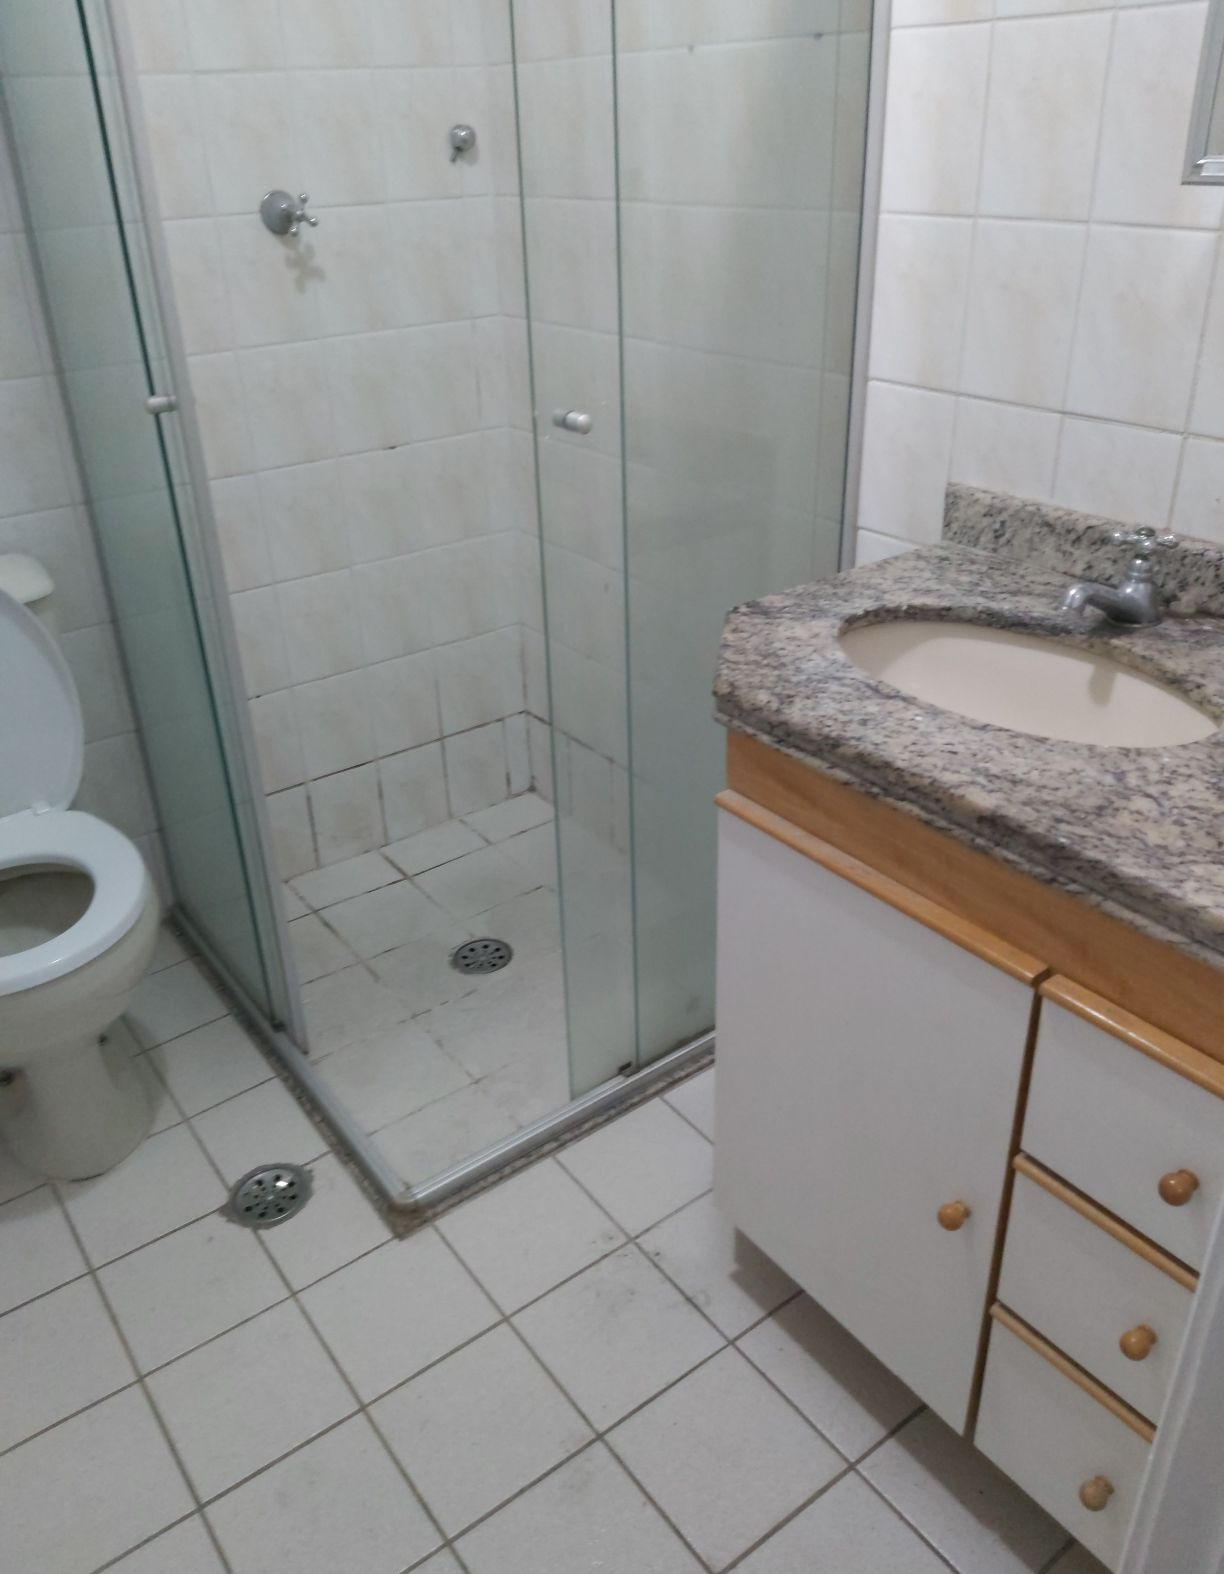 banheiro antes